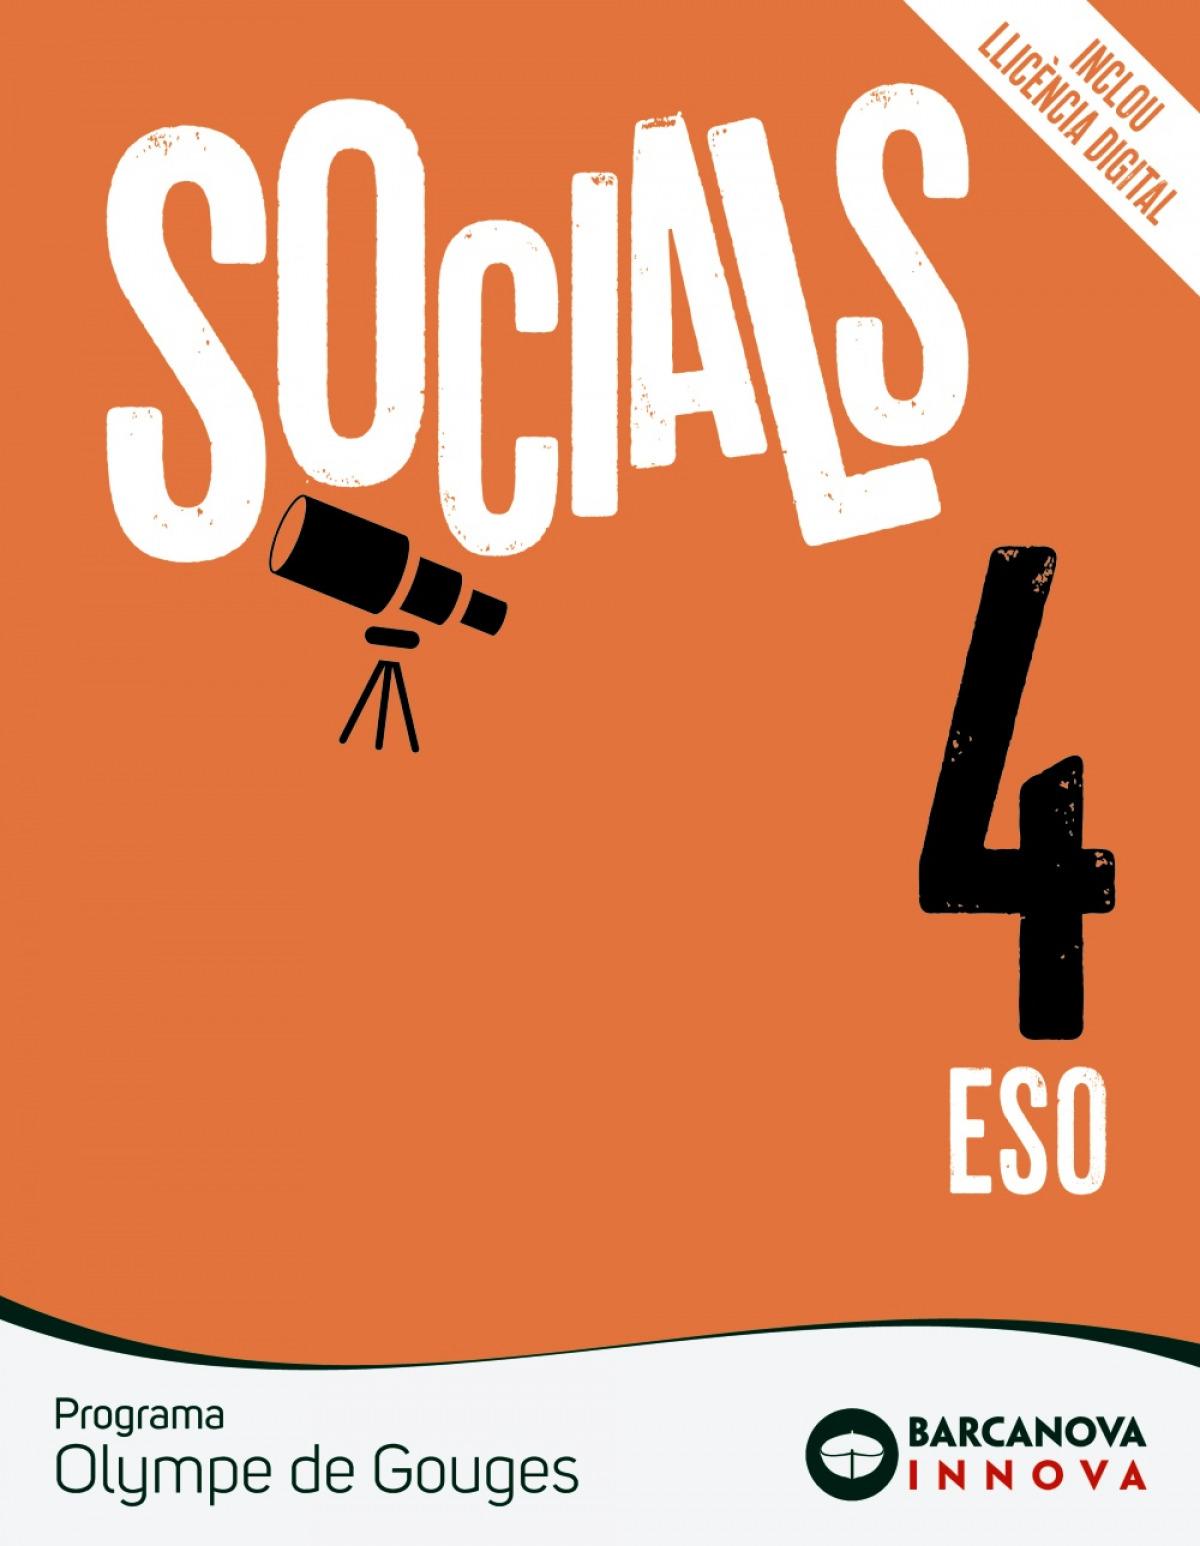 Olympe de Gouges 4 ESO. Socials